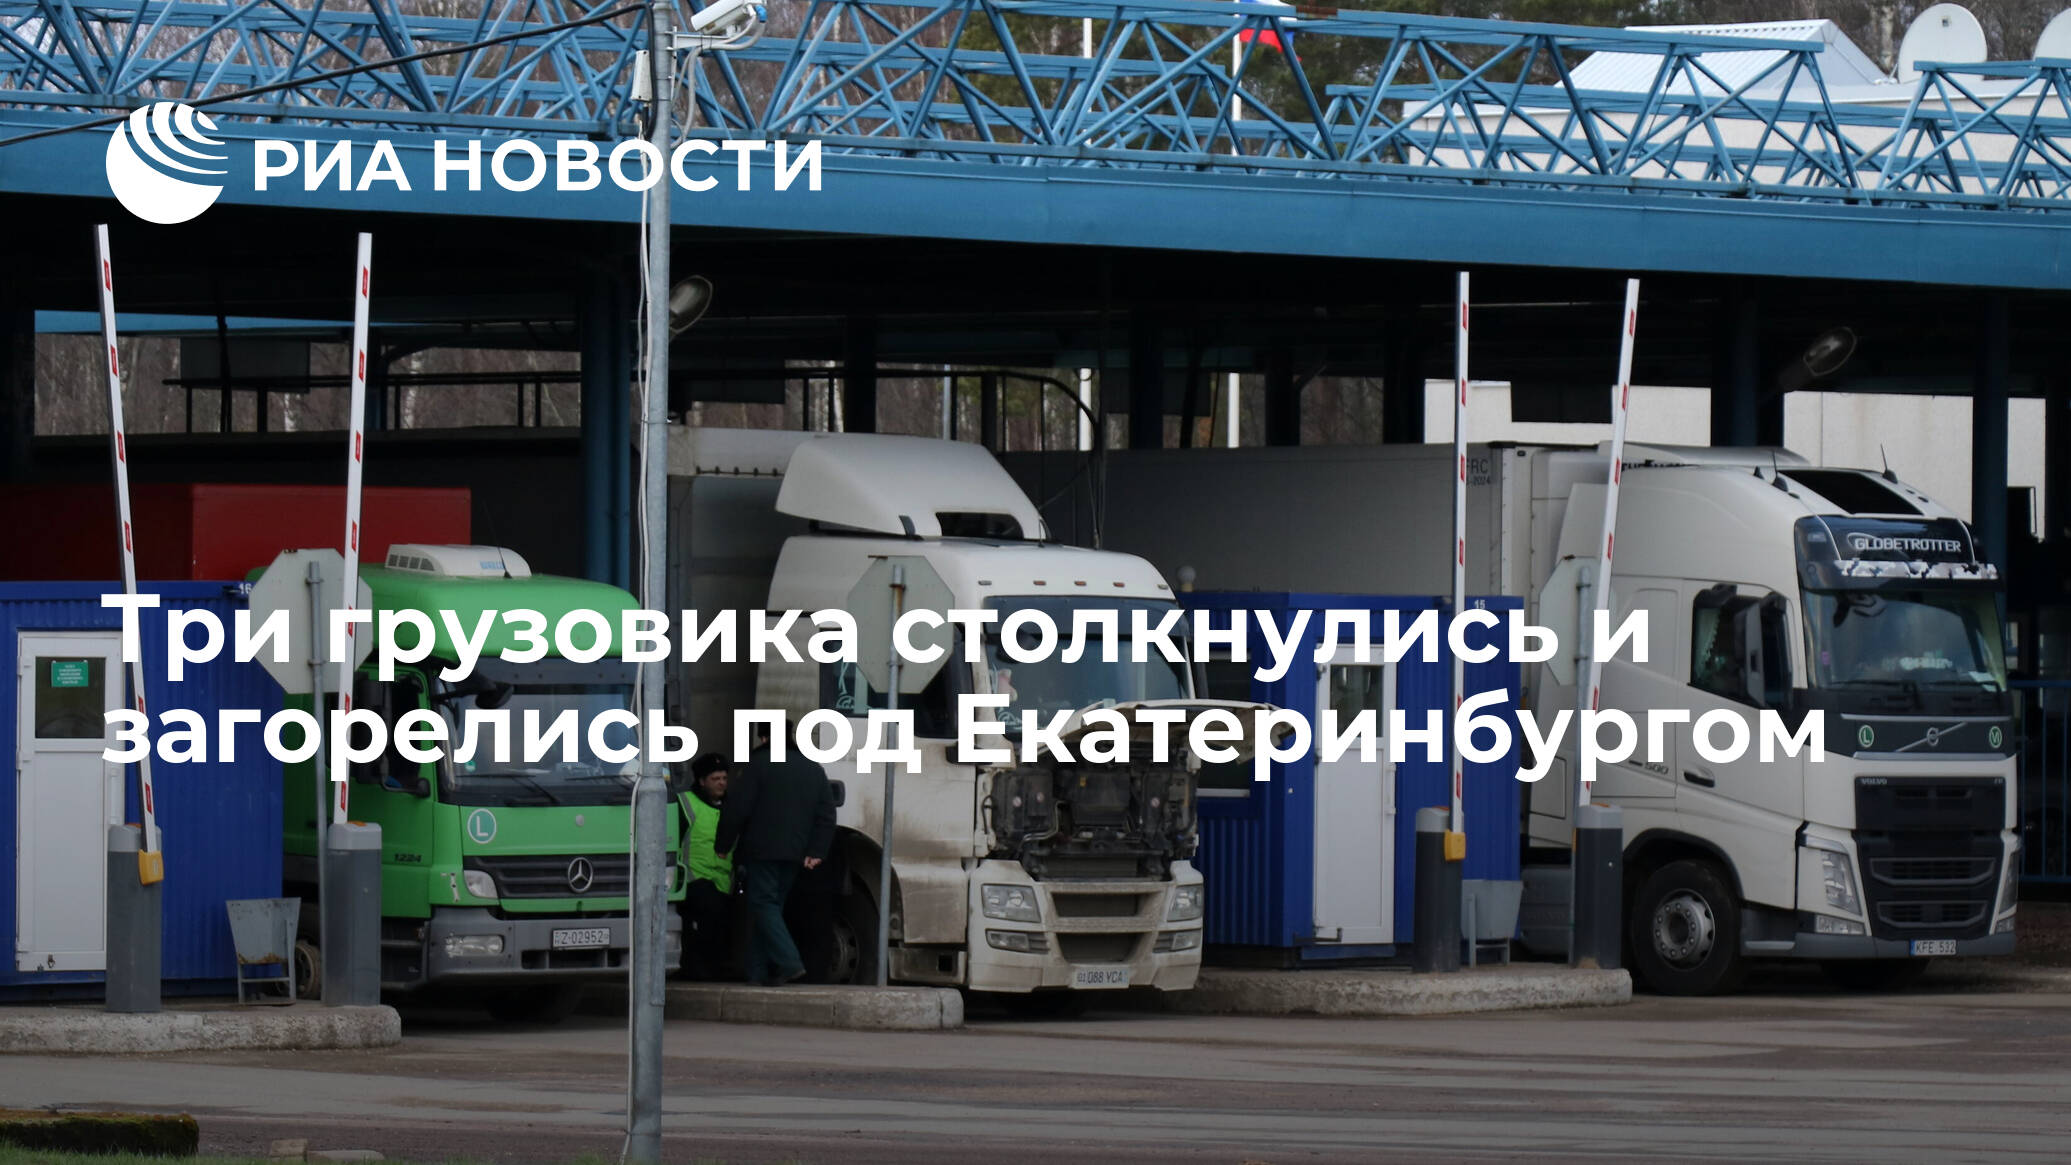 Три грузовика столкнулись и загорелись под Екатеринбургом